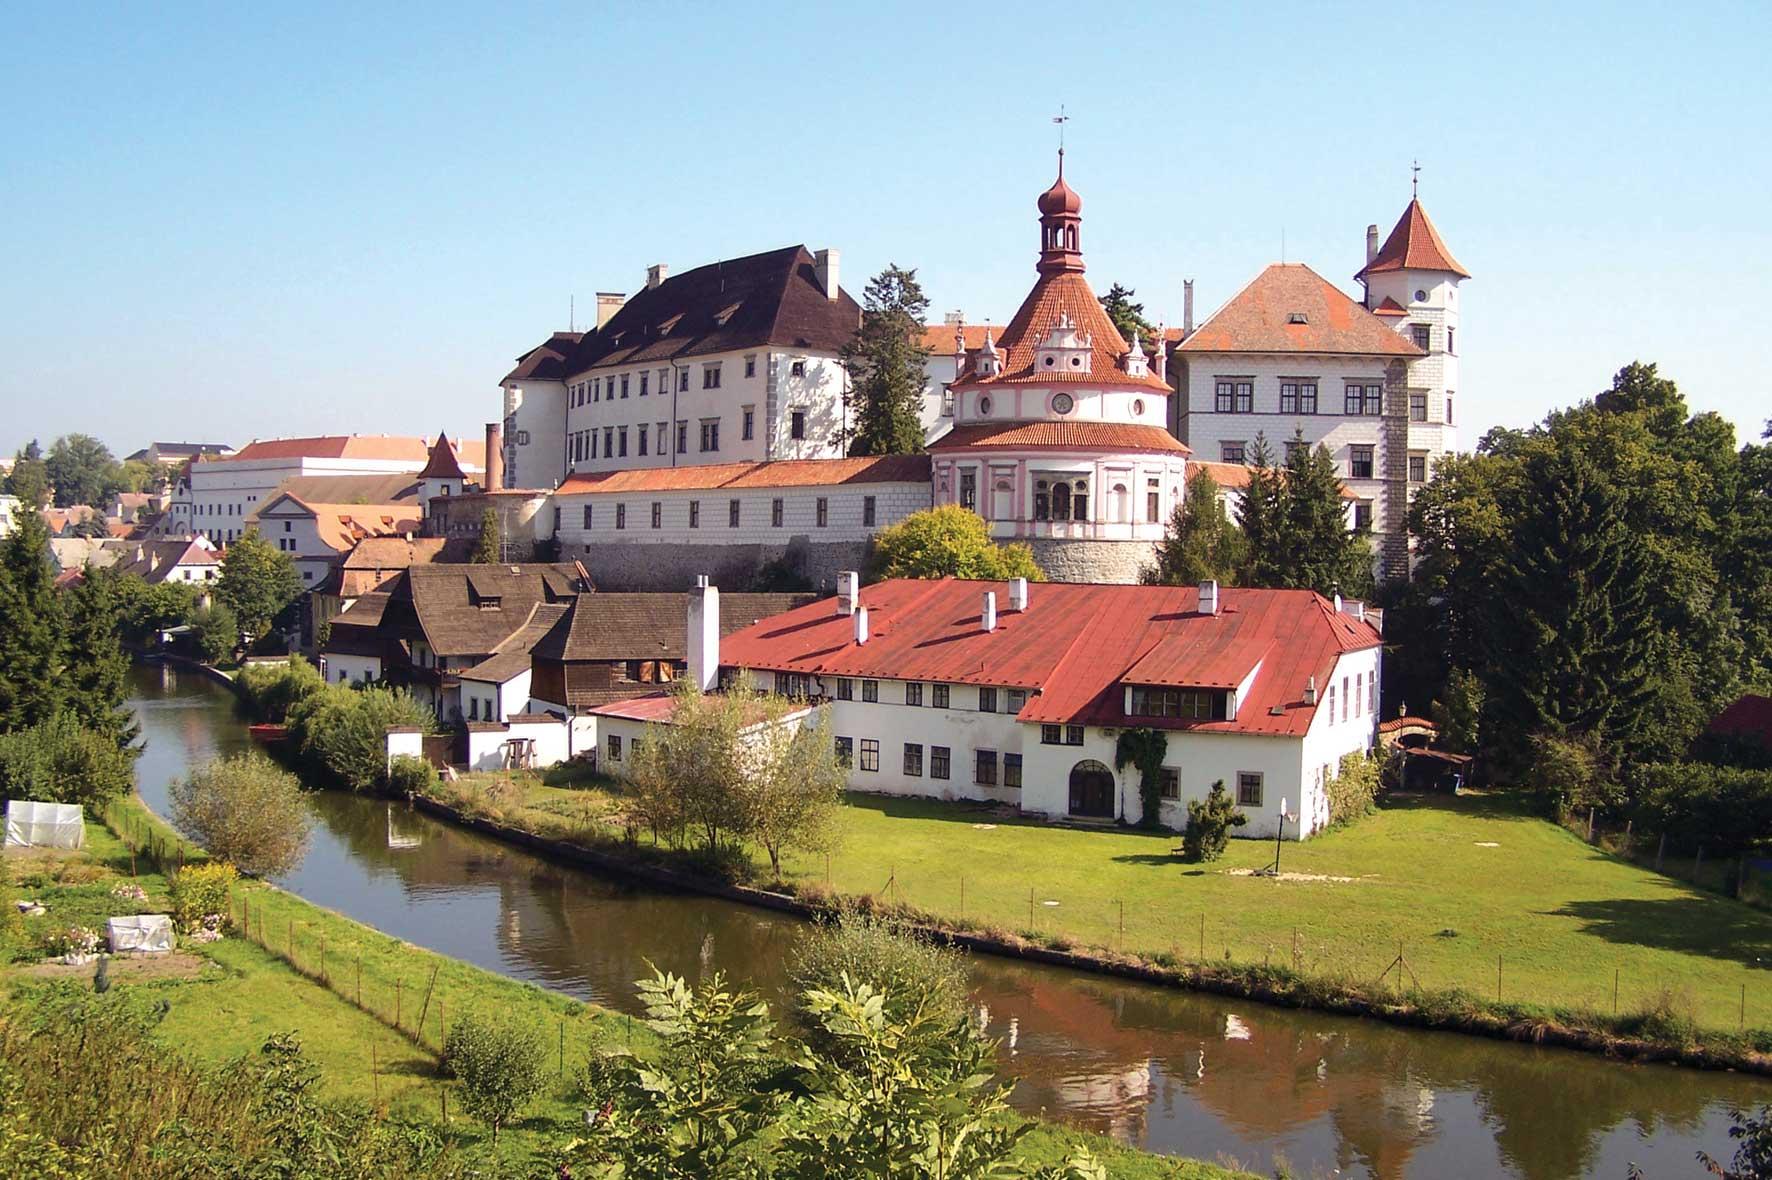 jindrichuv-hradec zamek kom